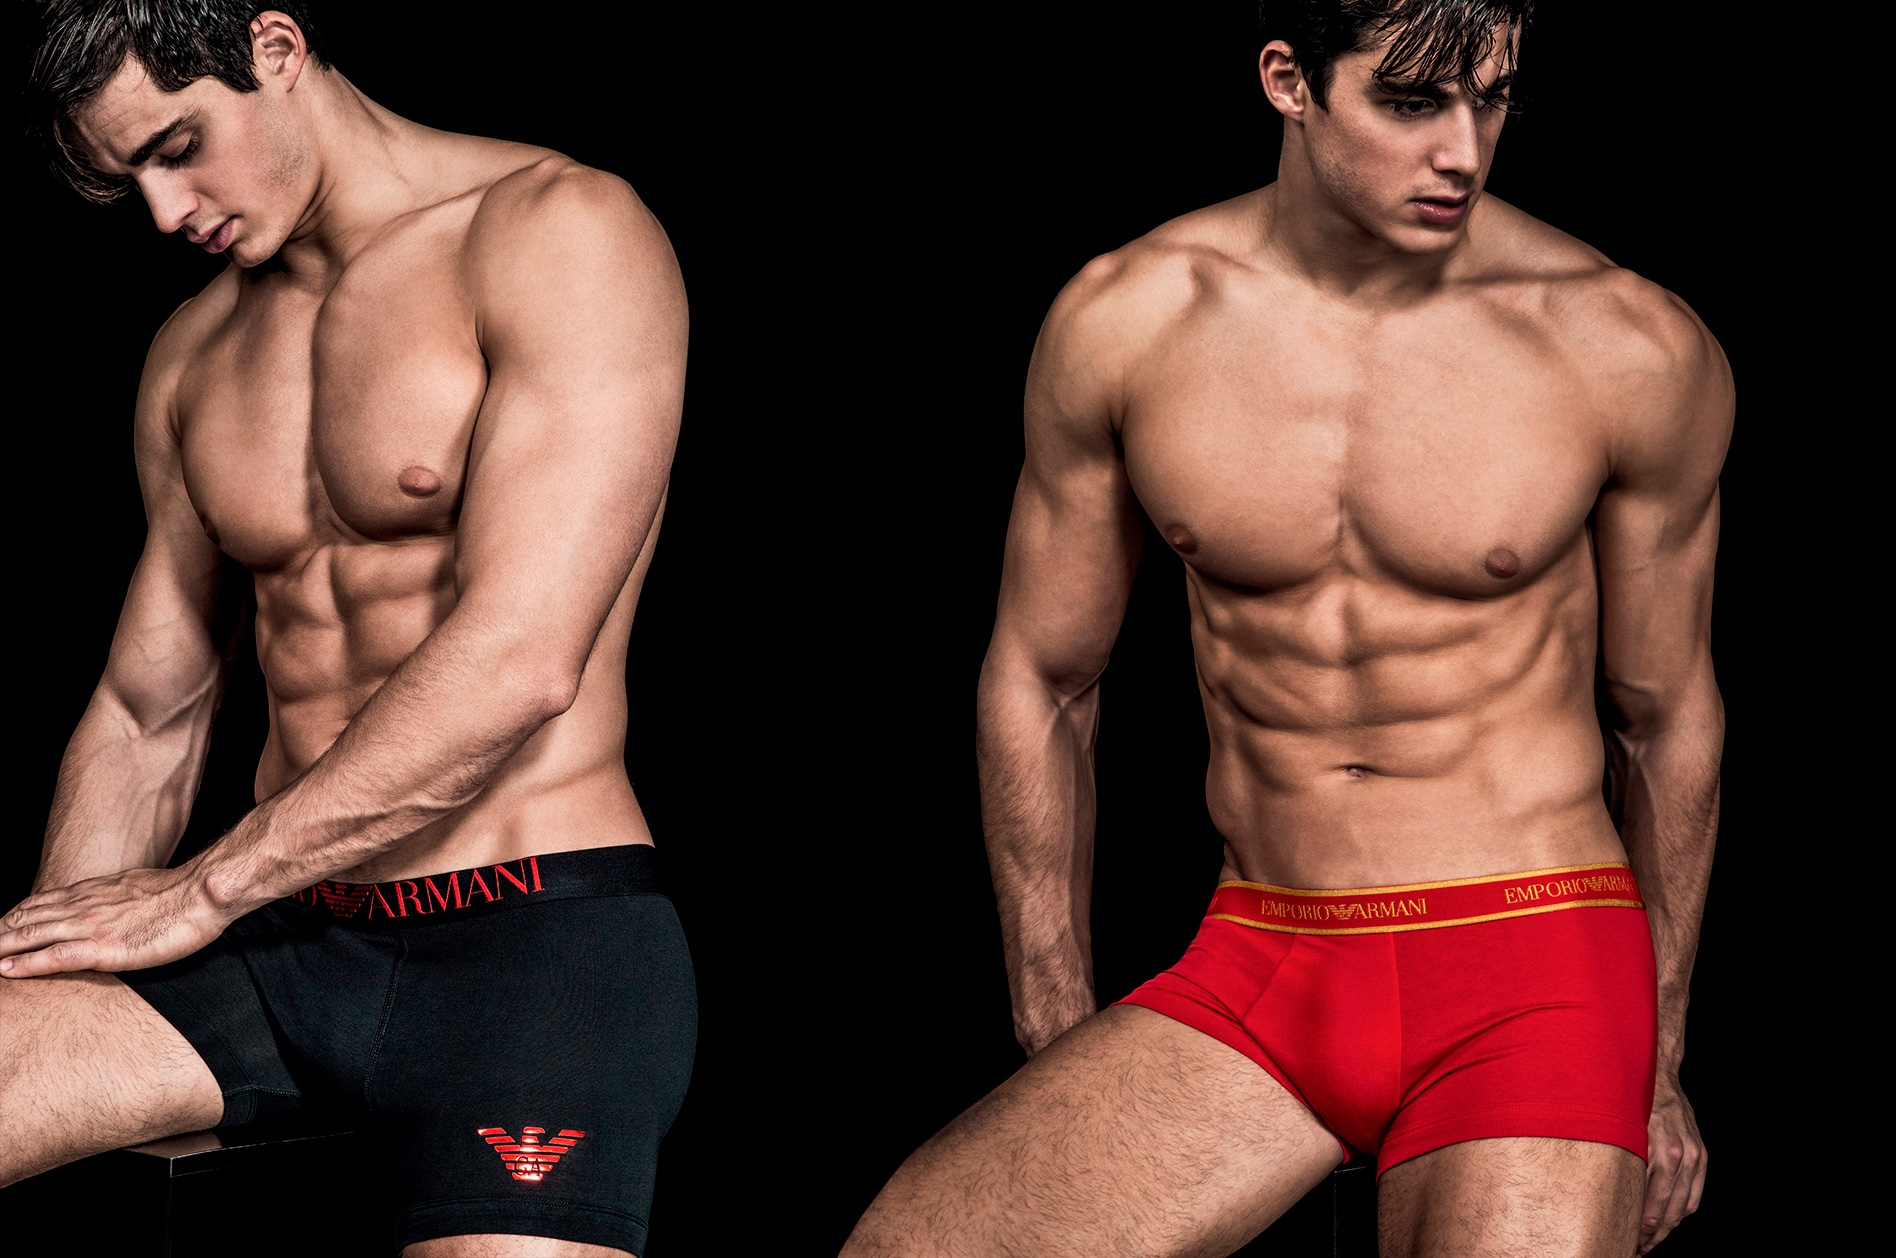 Emporio Armani Christmas underwears